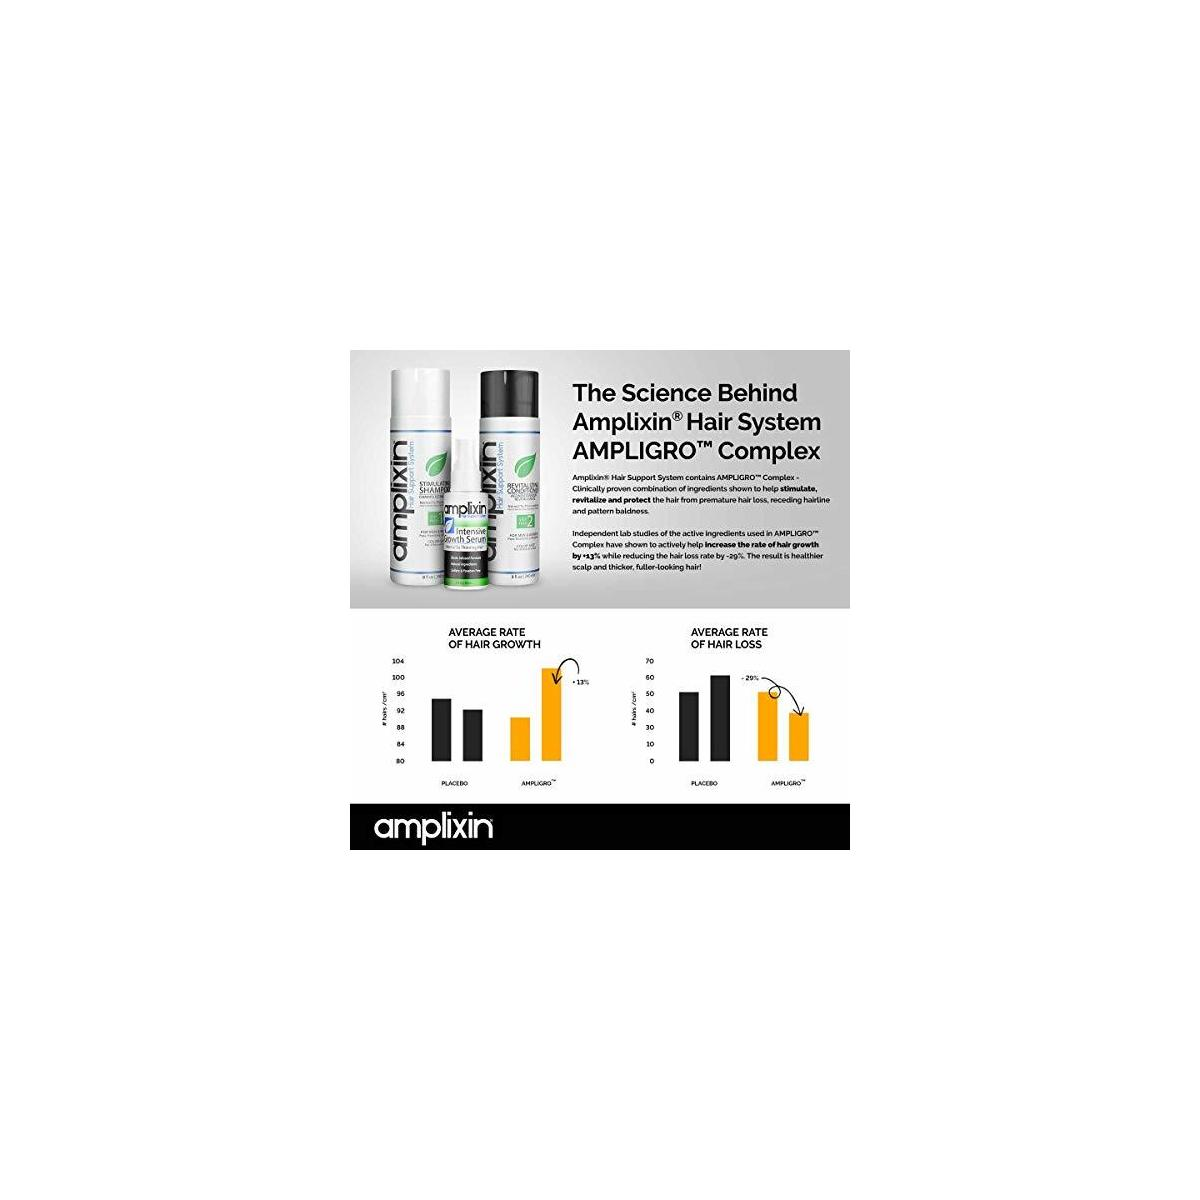 Amplixin Intensive Biotin Hair Growth Serum